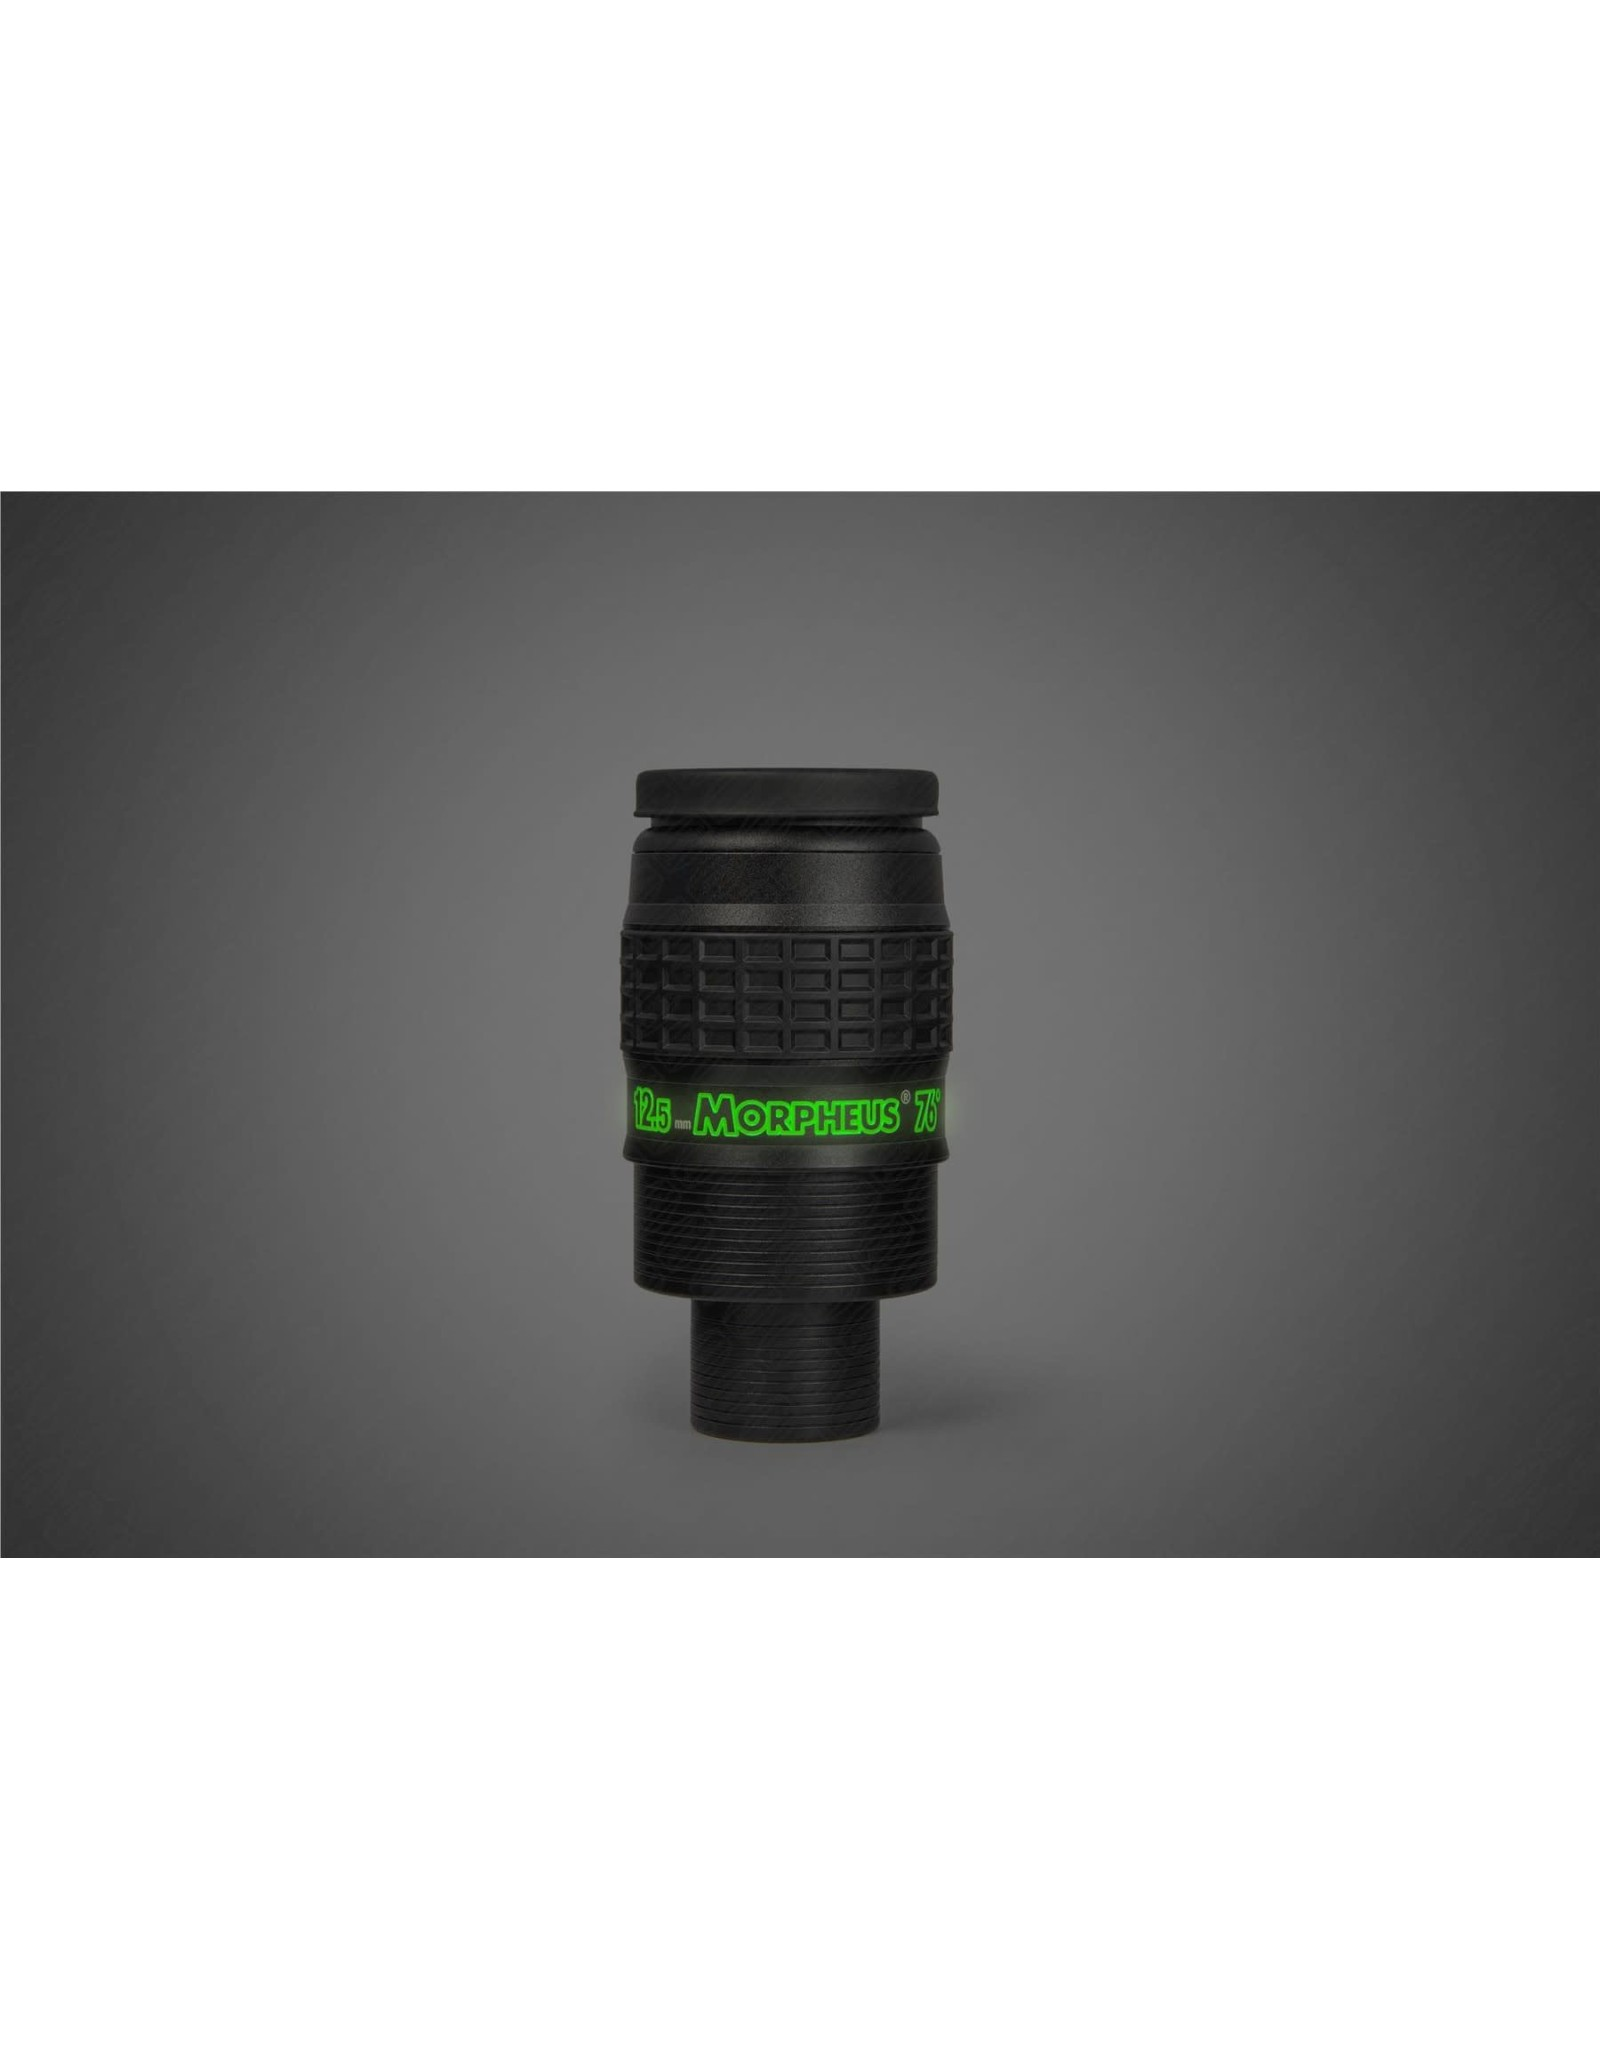 Baader Planetarium Baader Morpheus 76deg Eyepiece 12.5mm